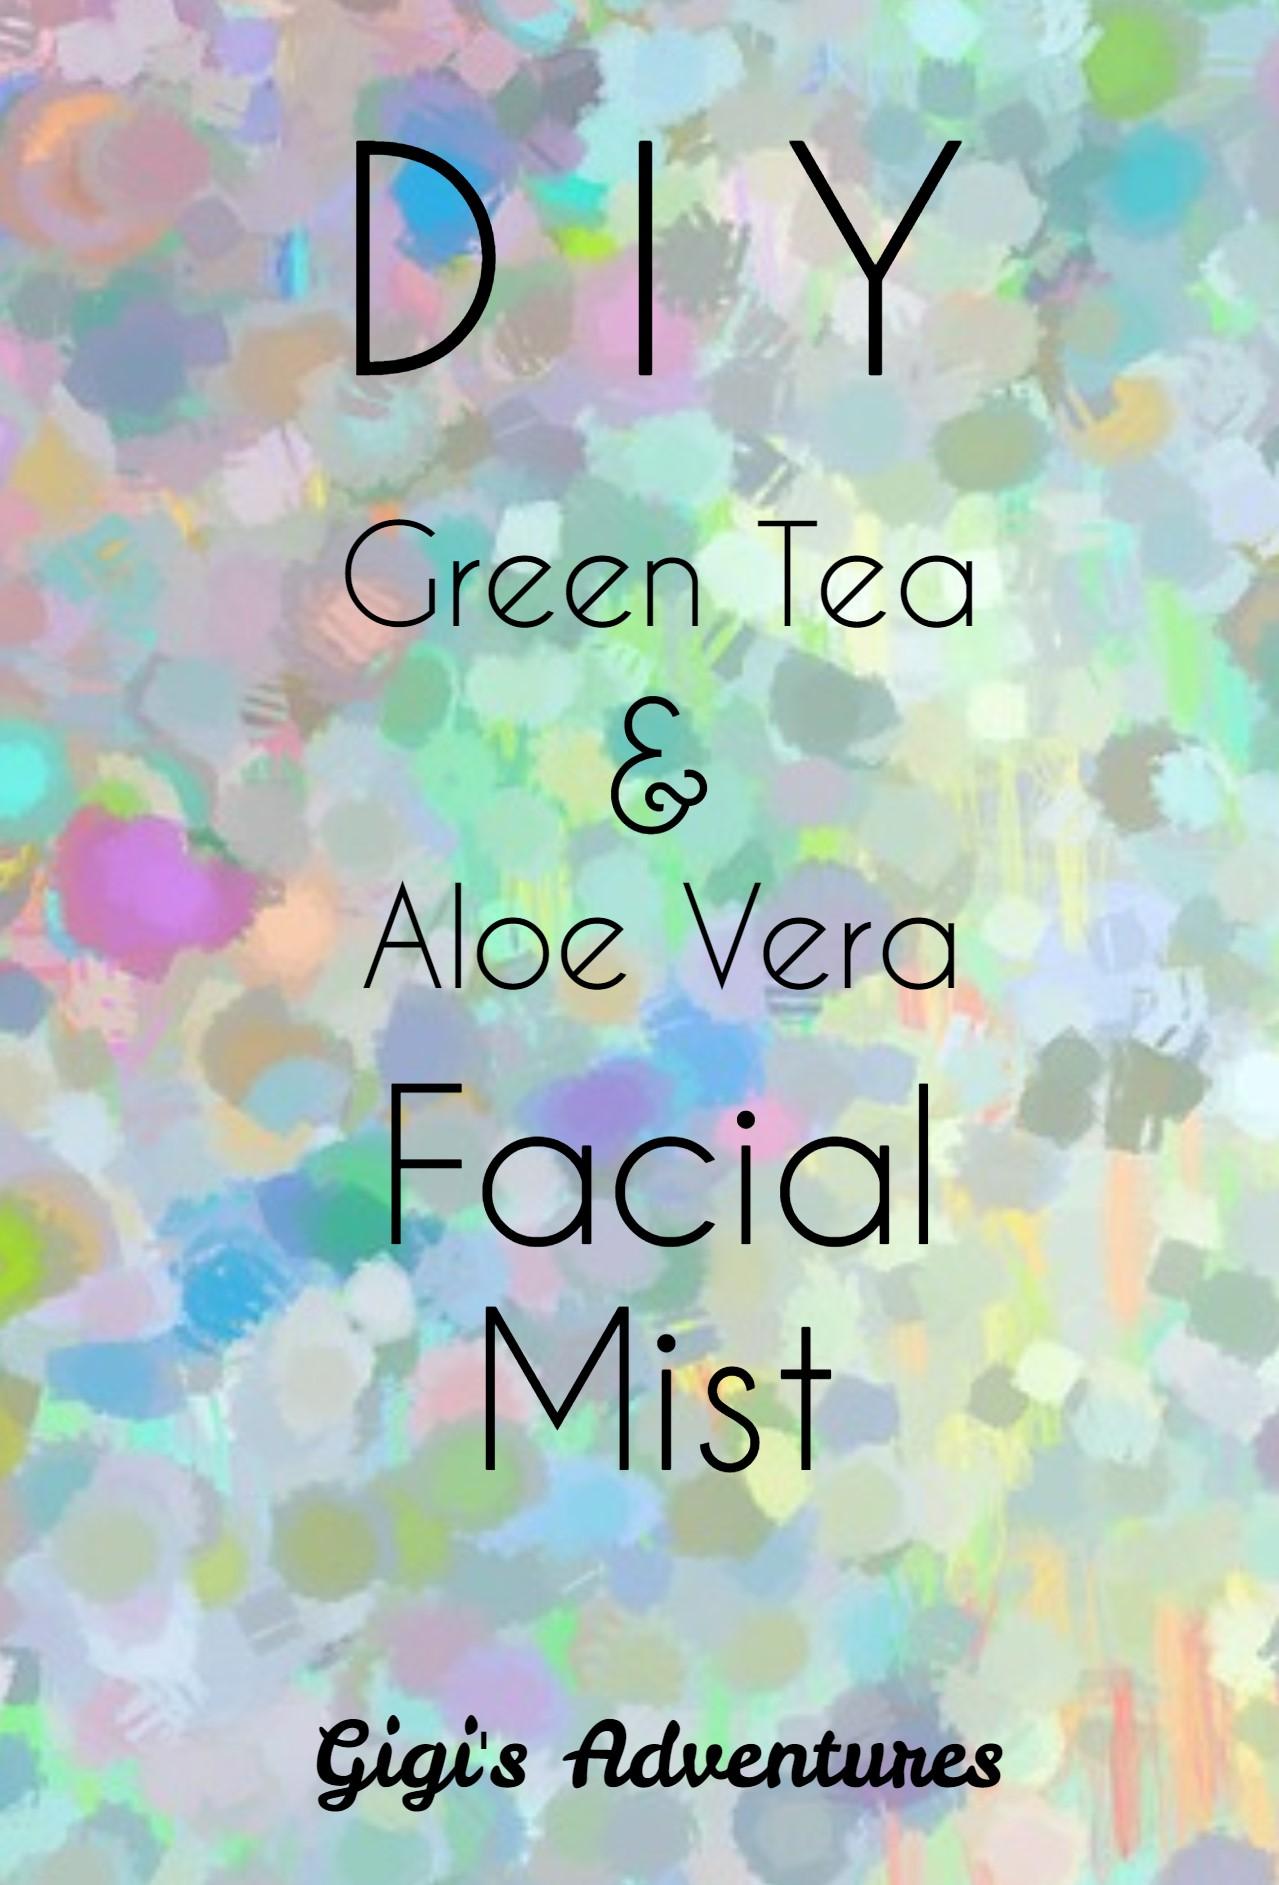 DIY Green Tea & Aloe Vera Facial Mist